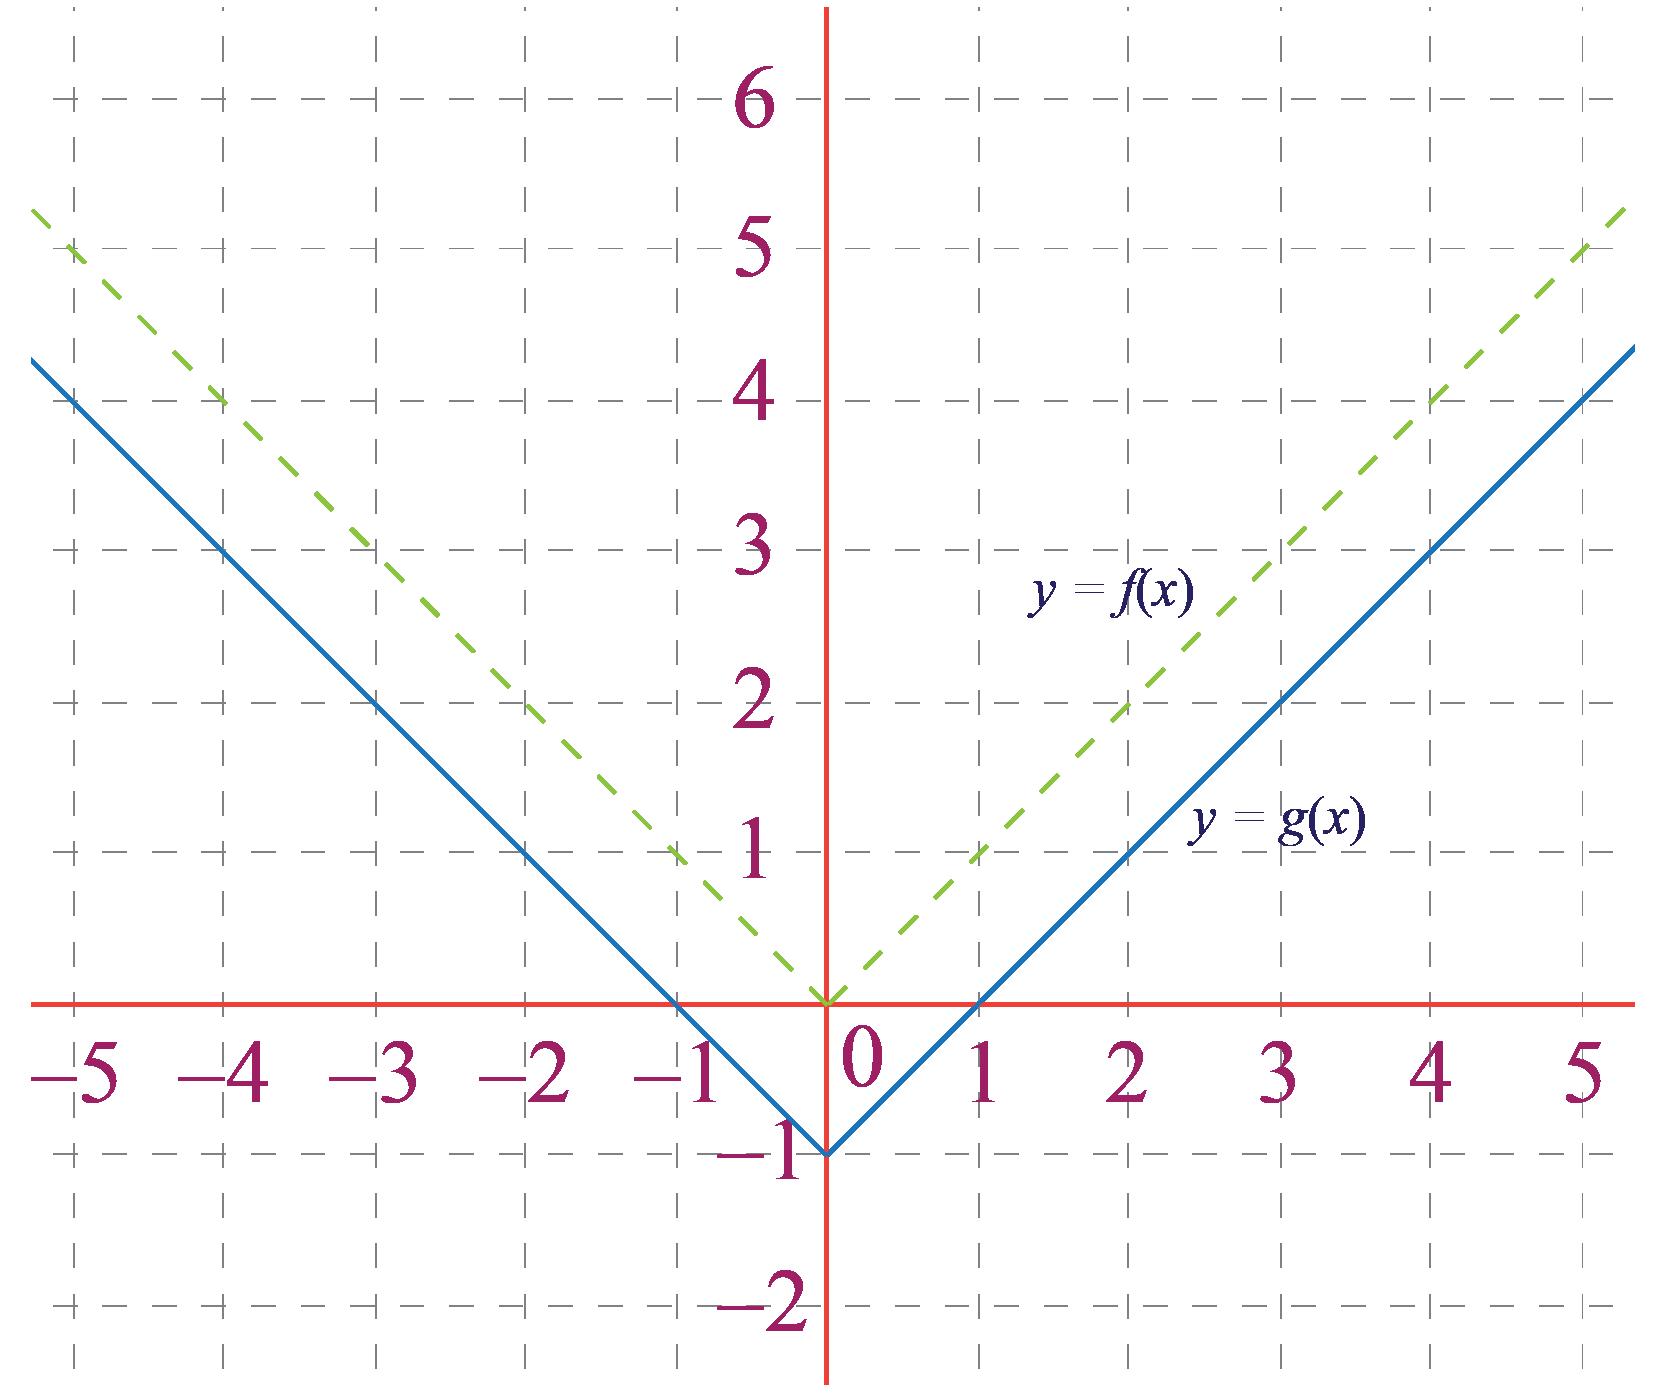 Vertical translation graph 2